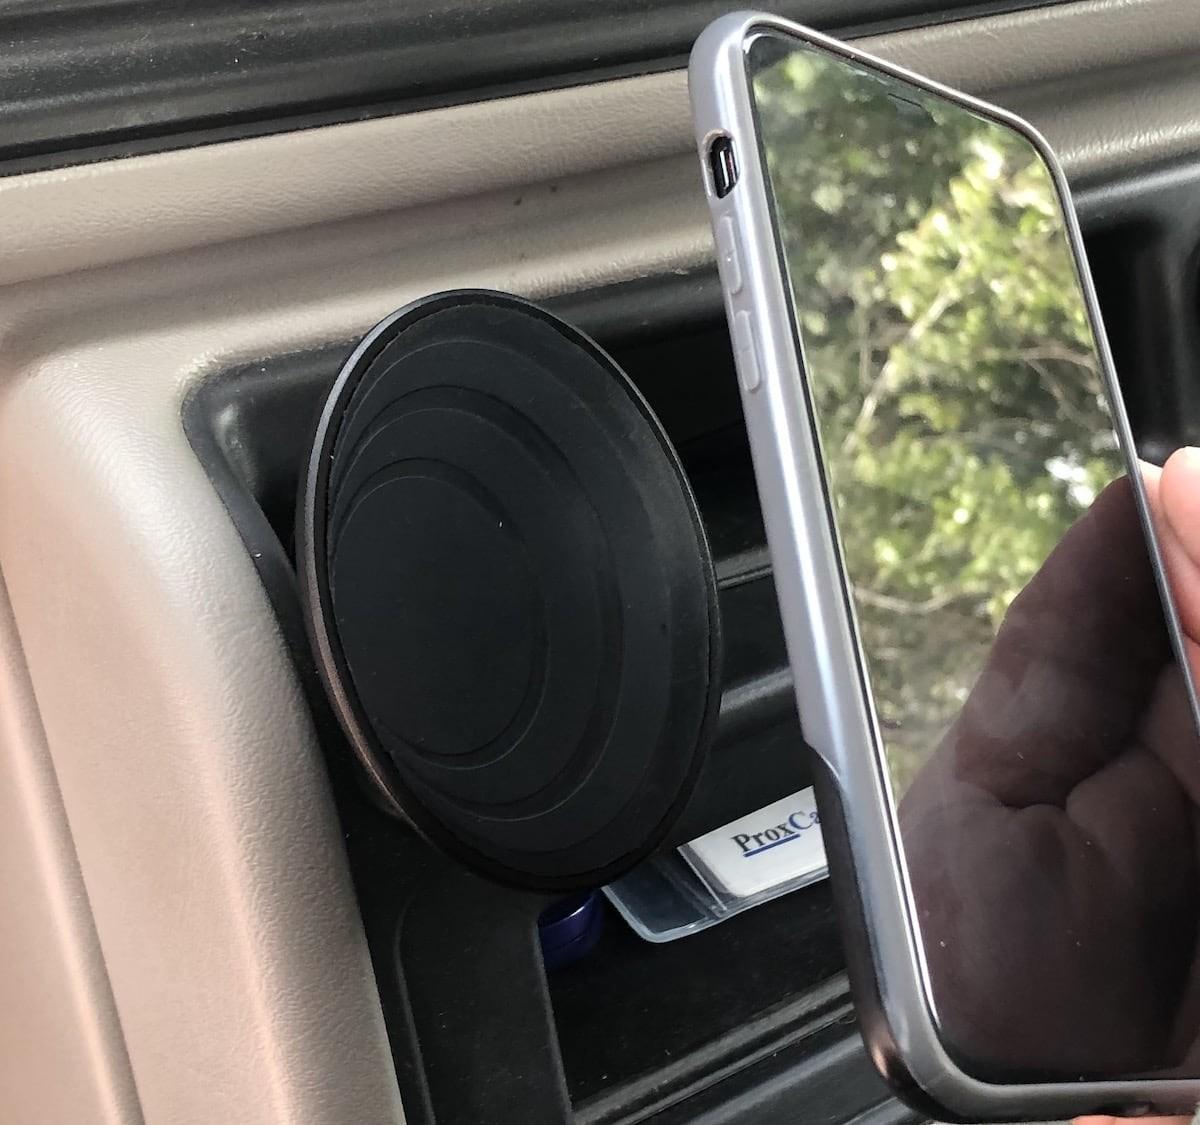 Halo Protective Smartphone Cover & Accessories block harmful radiation